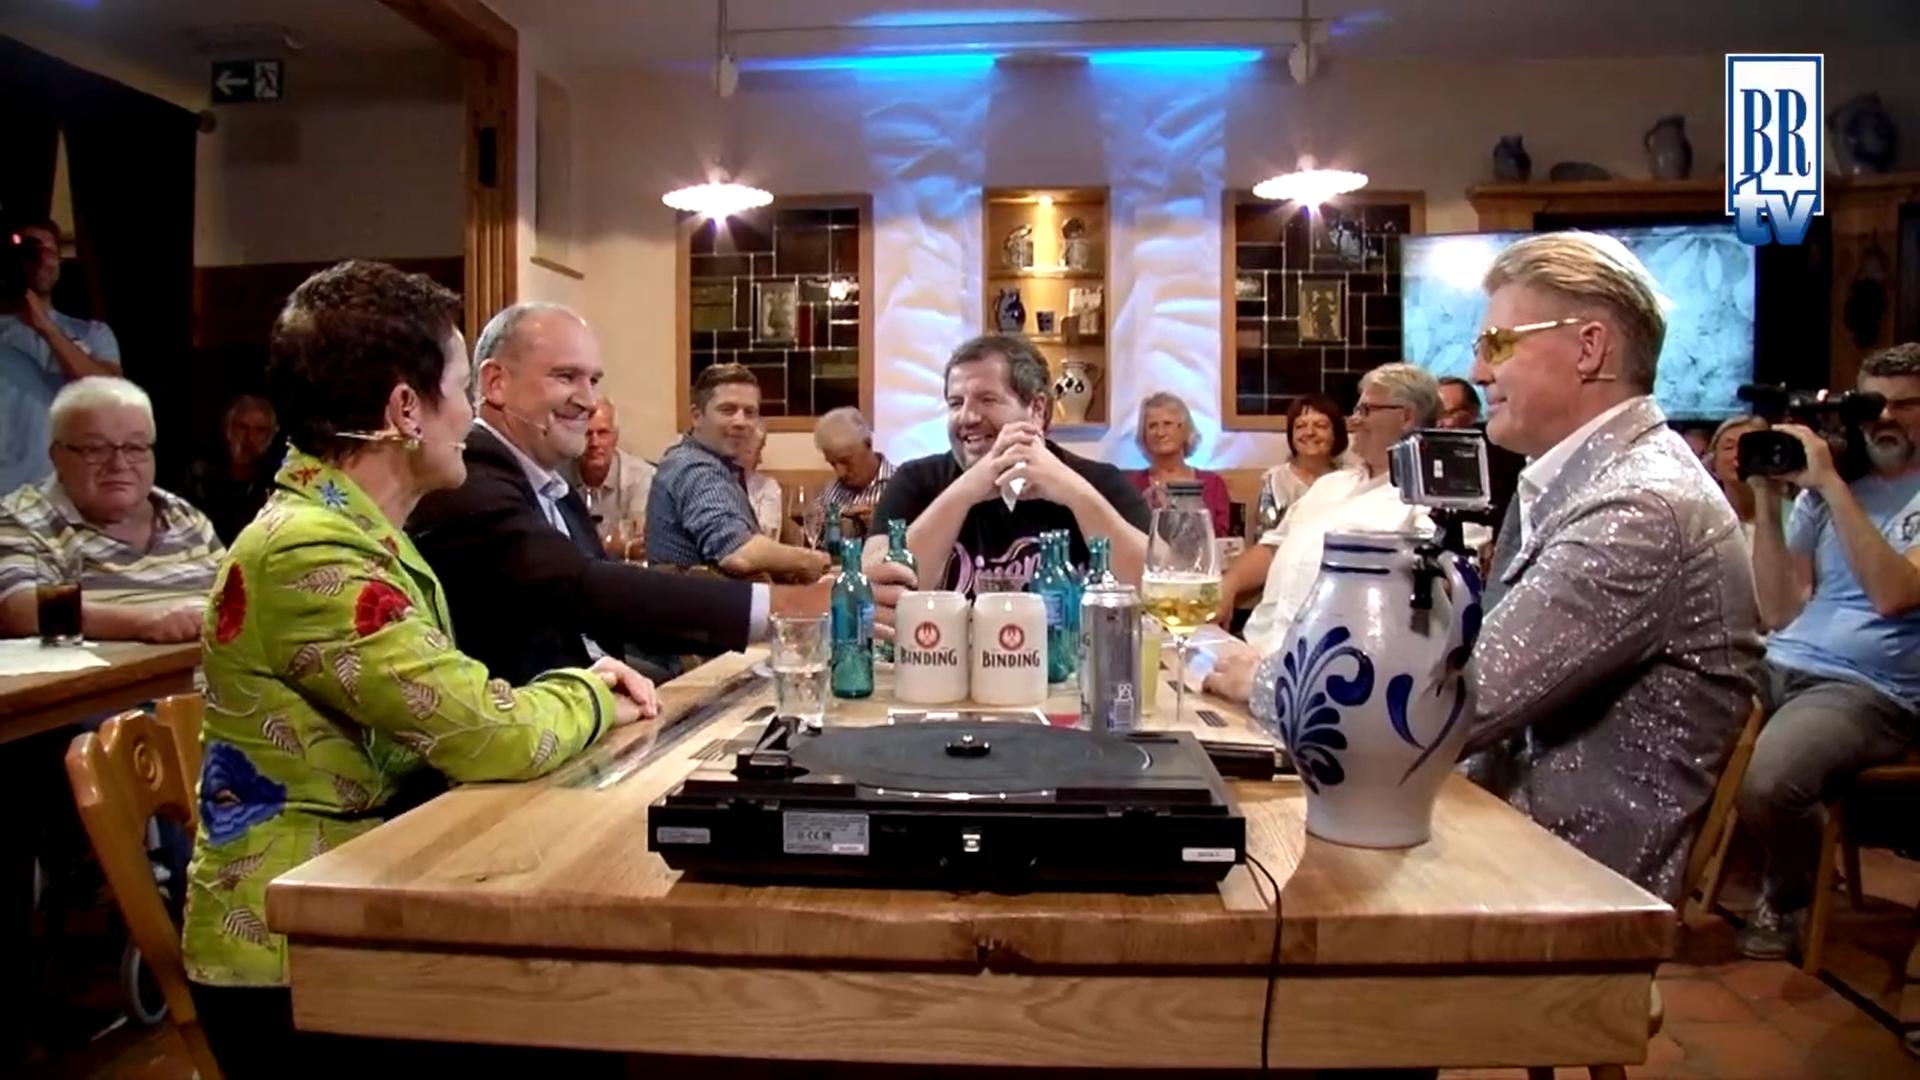 Bembel & Gebabbel – Folge 27 mit Rosemarie Heilig, Markus & Jörg Schmadtkeb